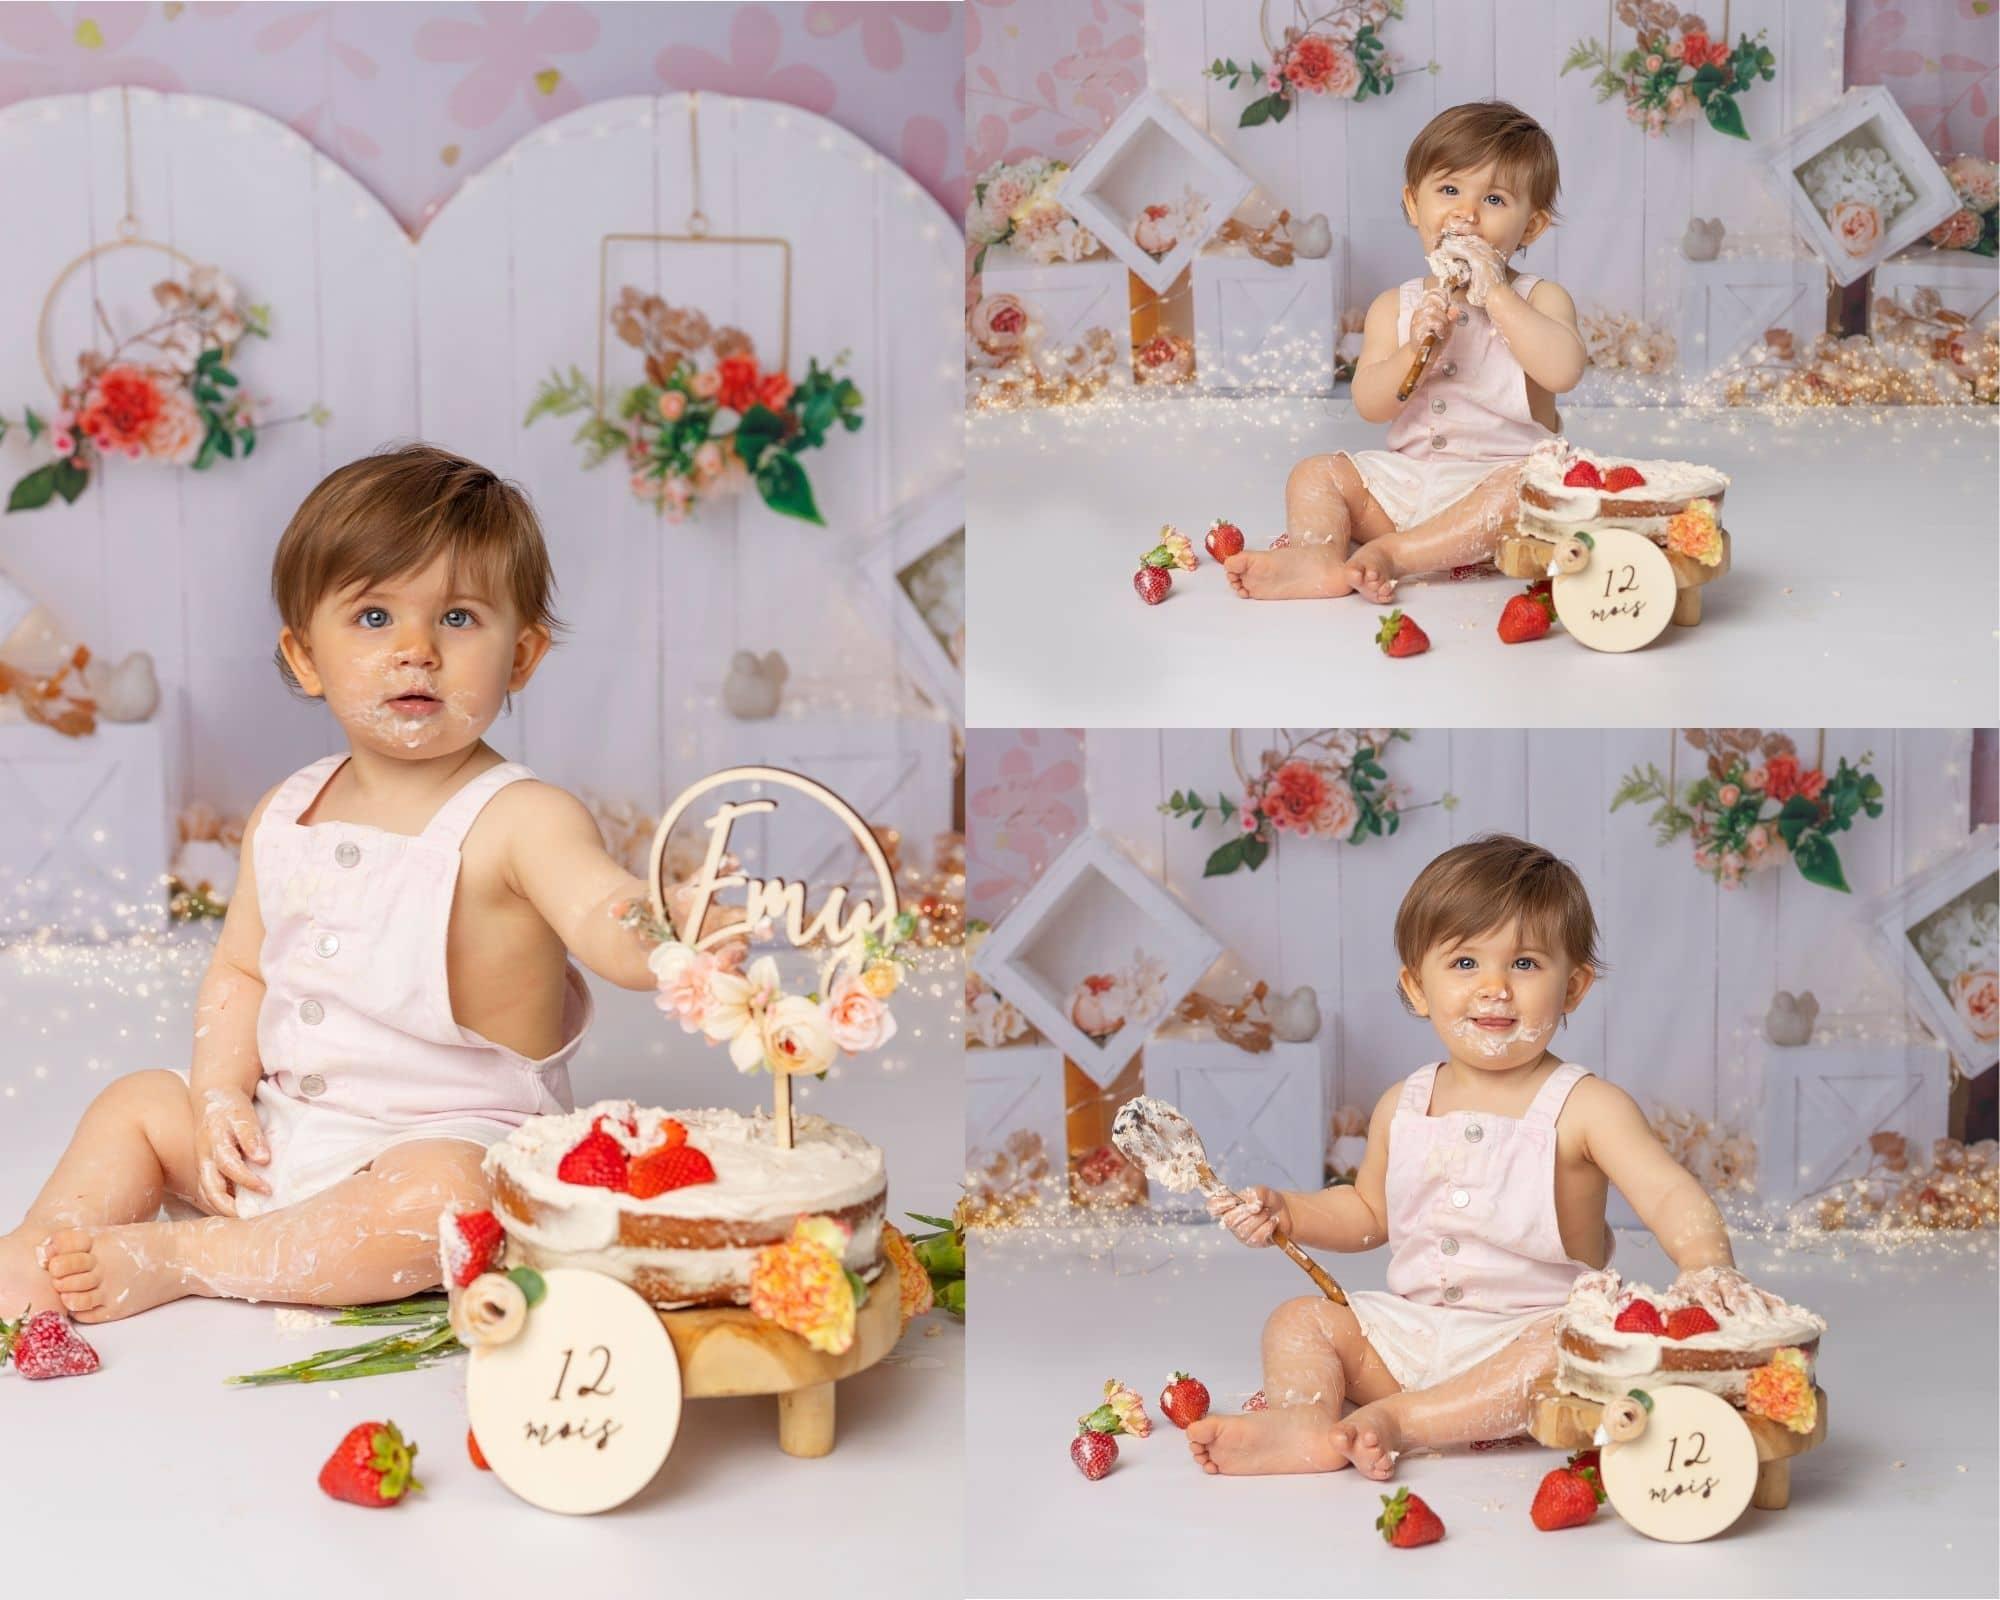 photographe-bebe-seance-smas-the-cake-strasbourg-clover-photographies-5